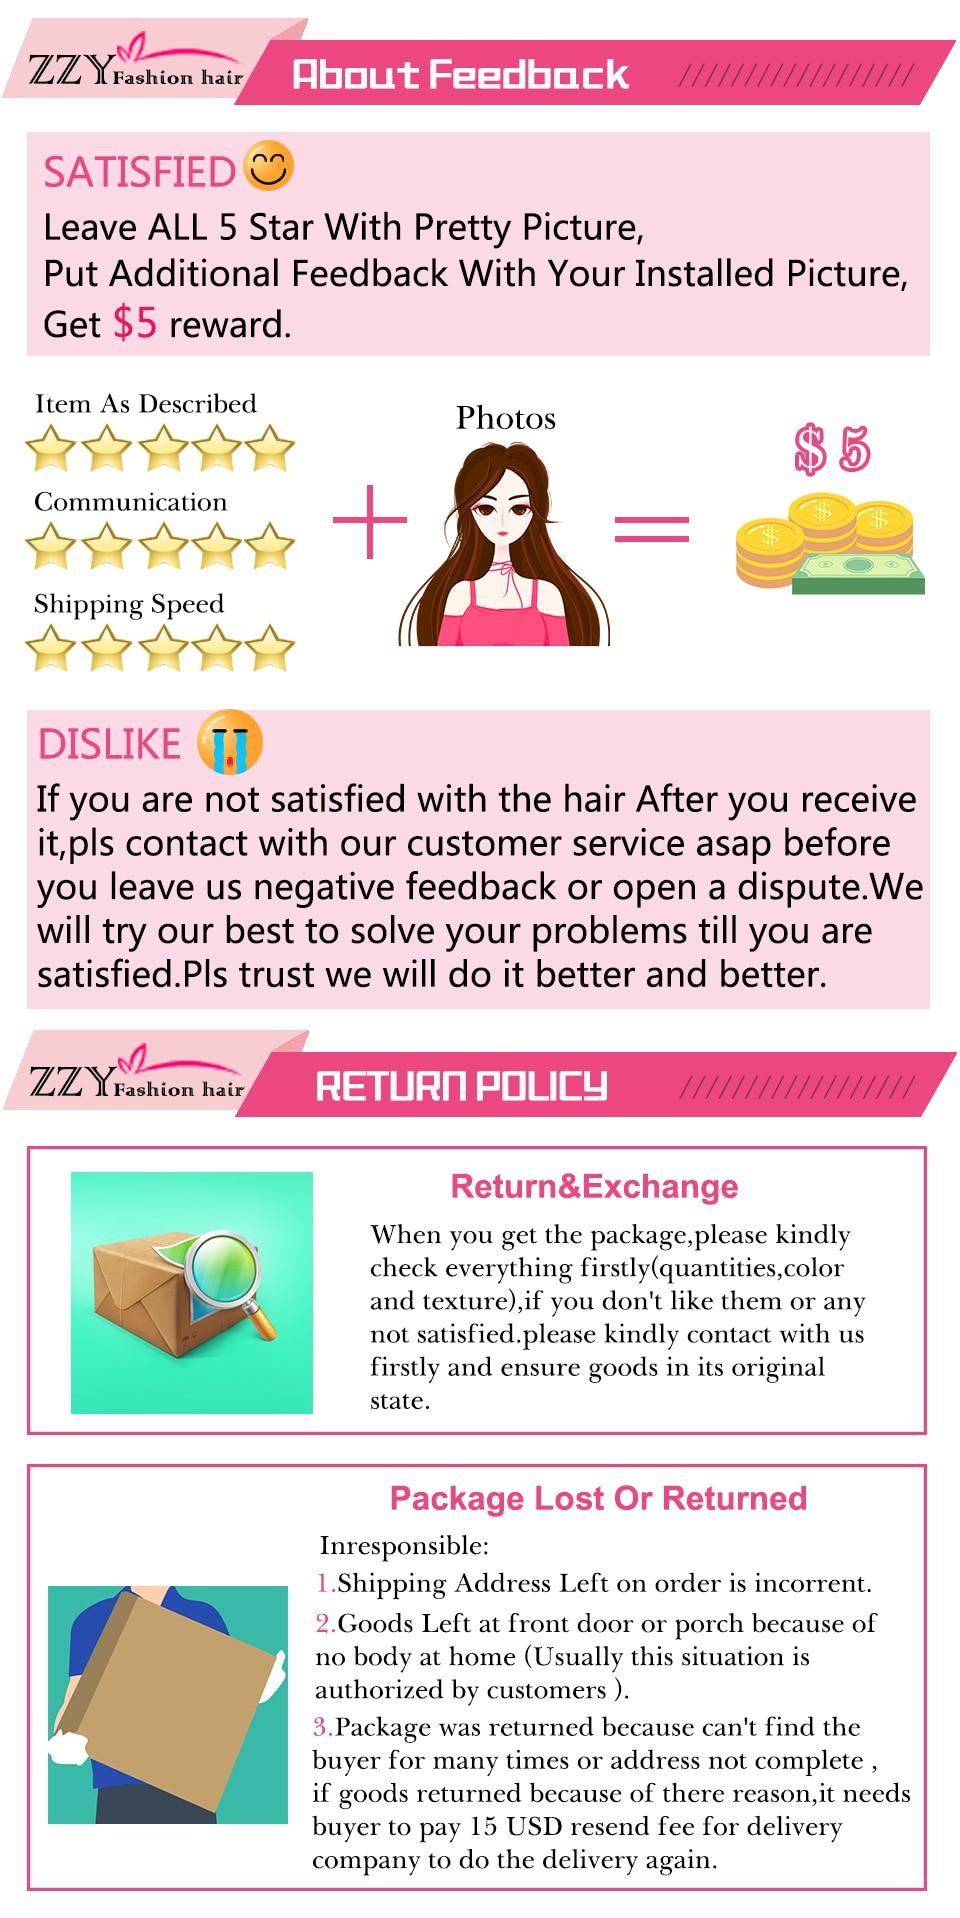 H0c11ebbe4d8b4c6fb13eabc59021ed4eW ZZY Fashion Hair Brazilian Body Wave Bundles With Closure M Ratio Non-Remy Human Hair Weave Bundles With Closure